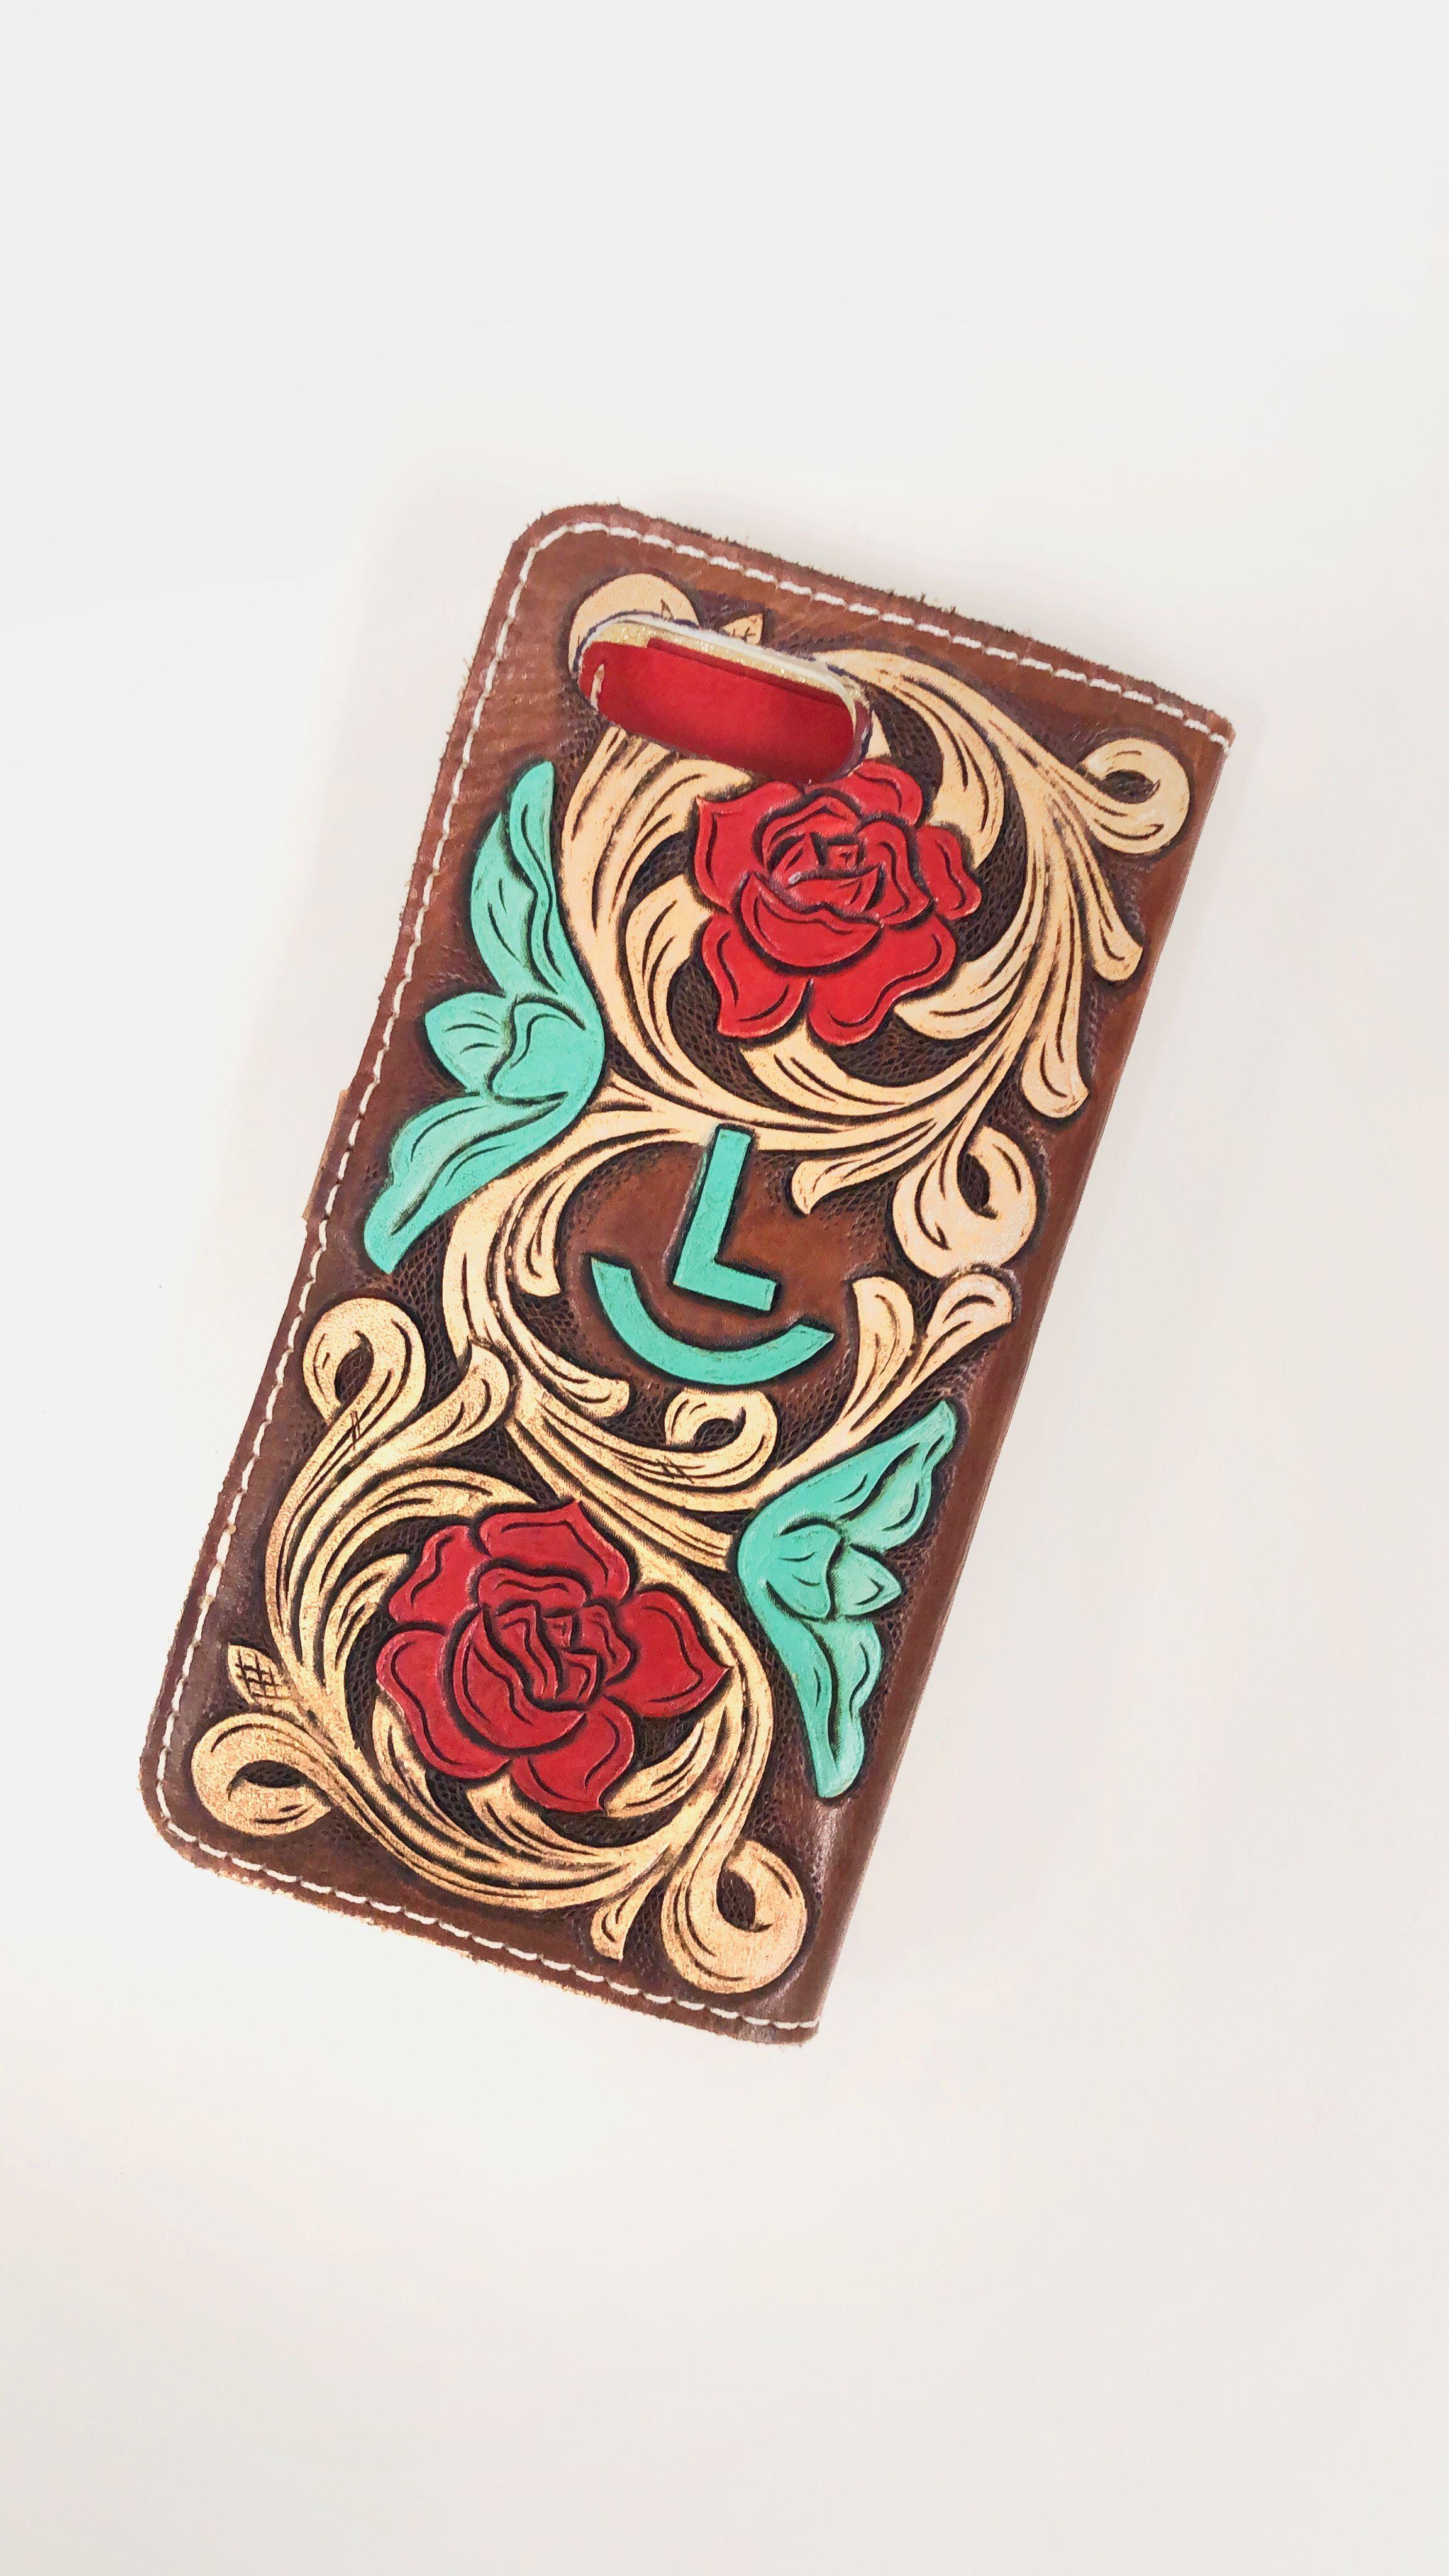 Custom tooled leather rose phone case